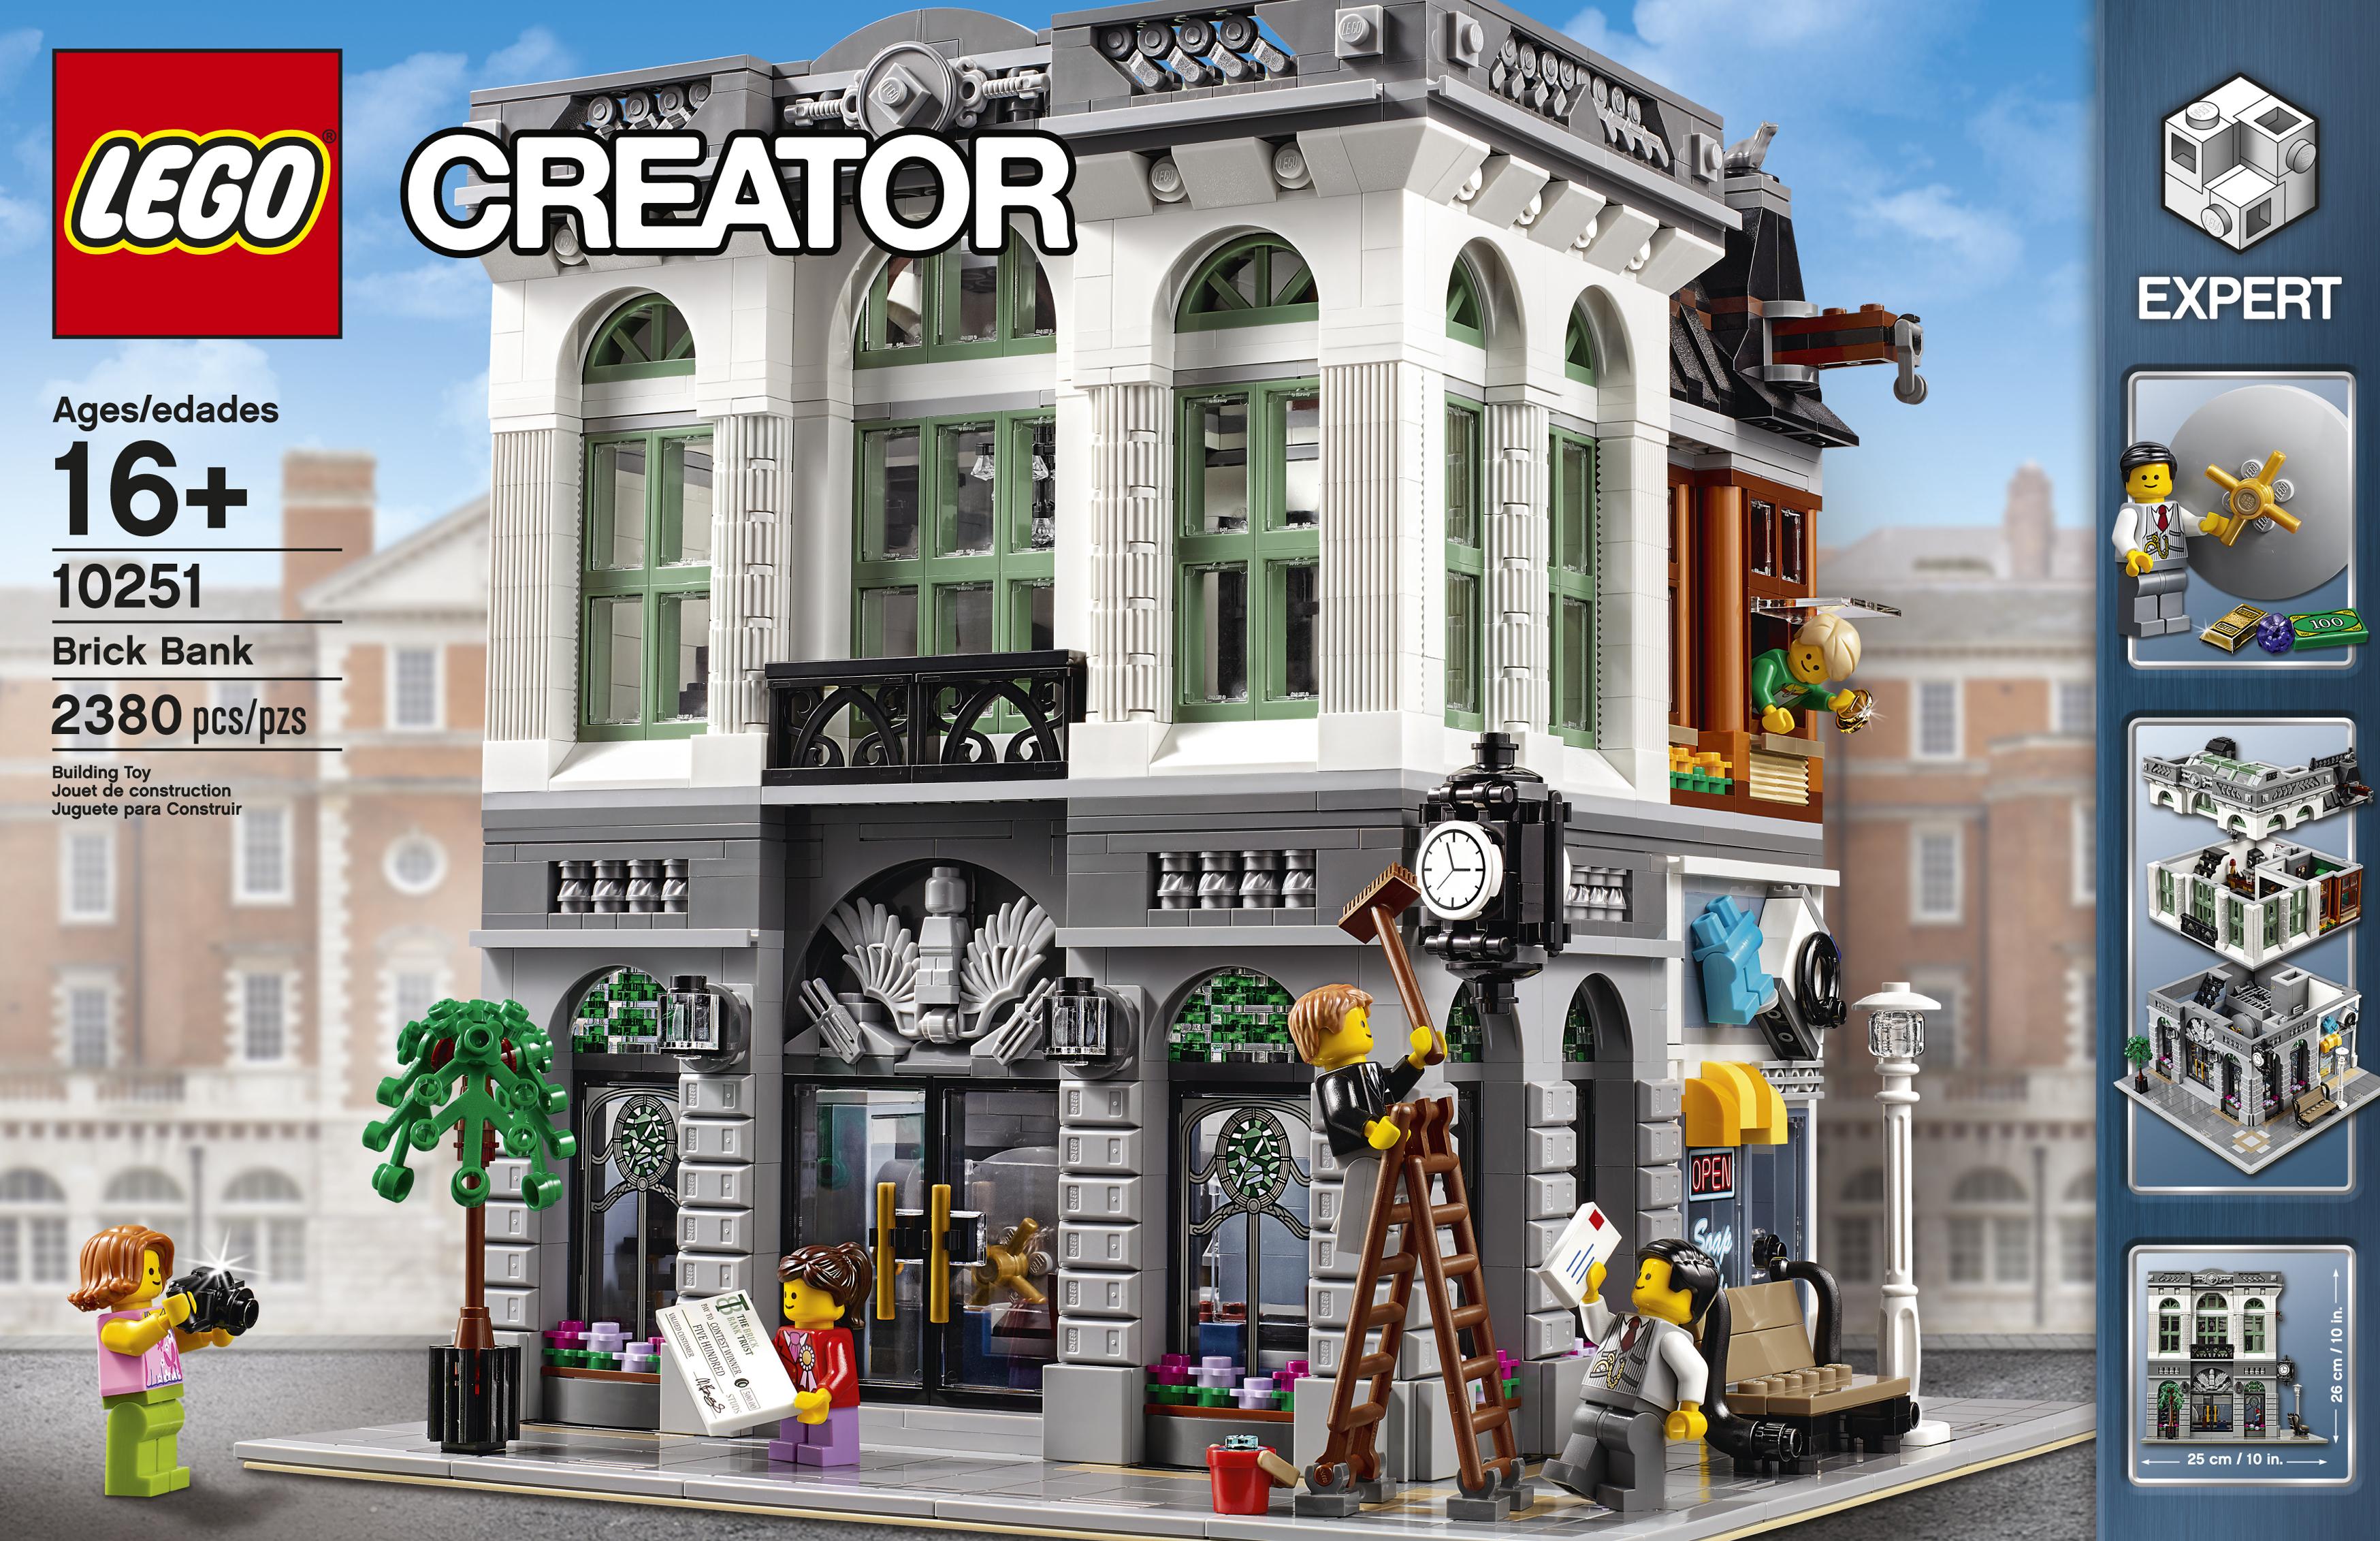 lego creator expert modular 10251 brick bank l 39 annonce. Black Bedroom Furniture Sets. Home Design Ideas